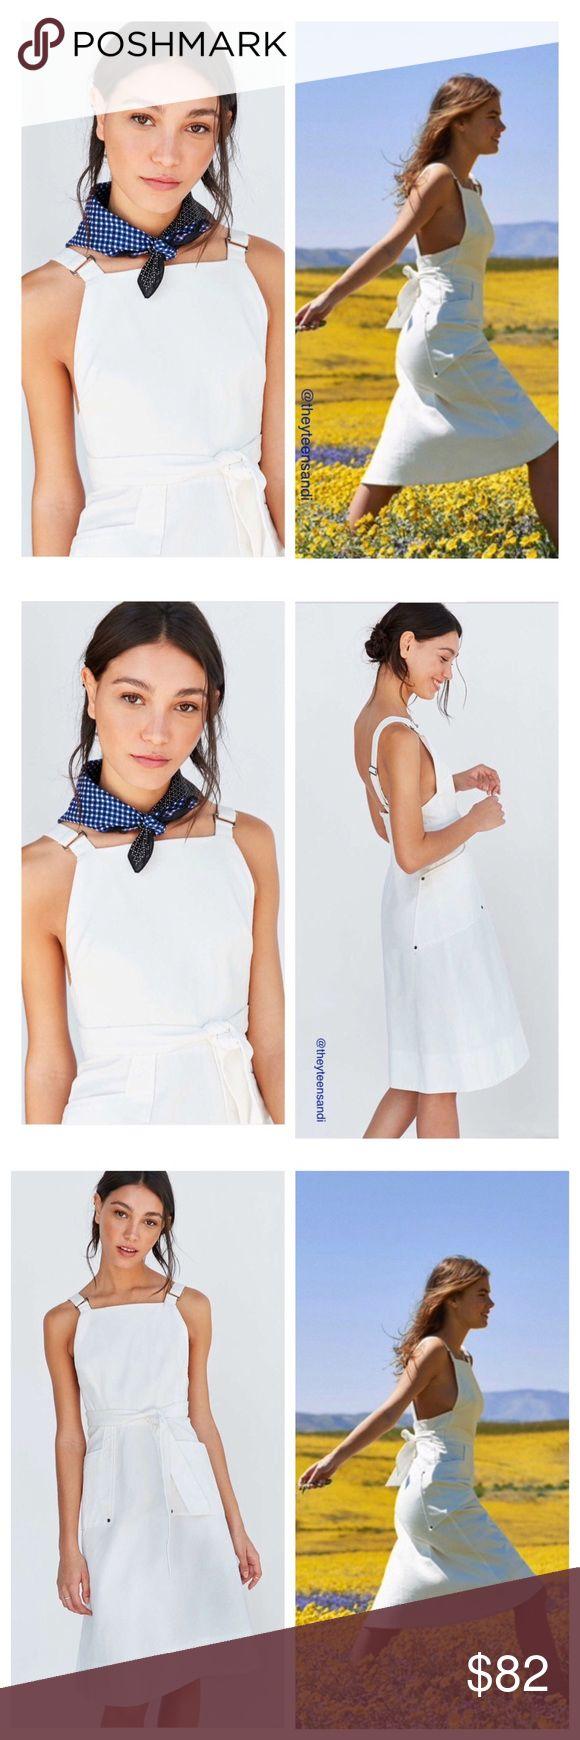 White denim apron - Urban Outfitters White Denim Overalls Apron Dress Nwt